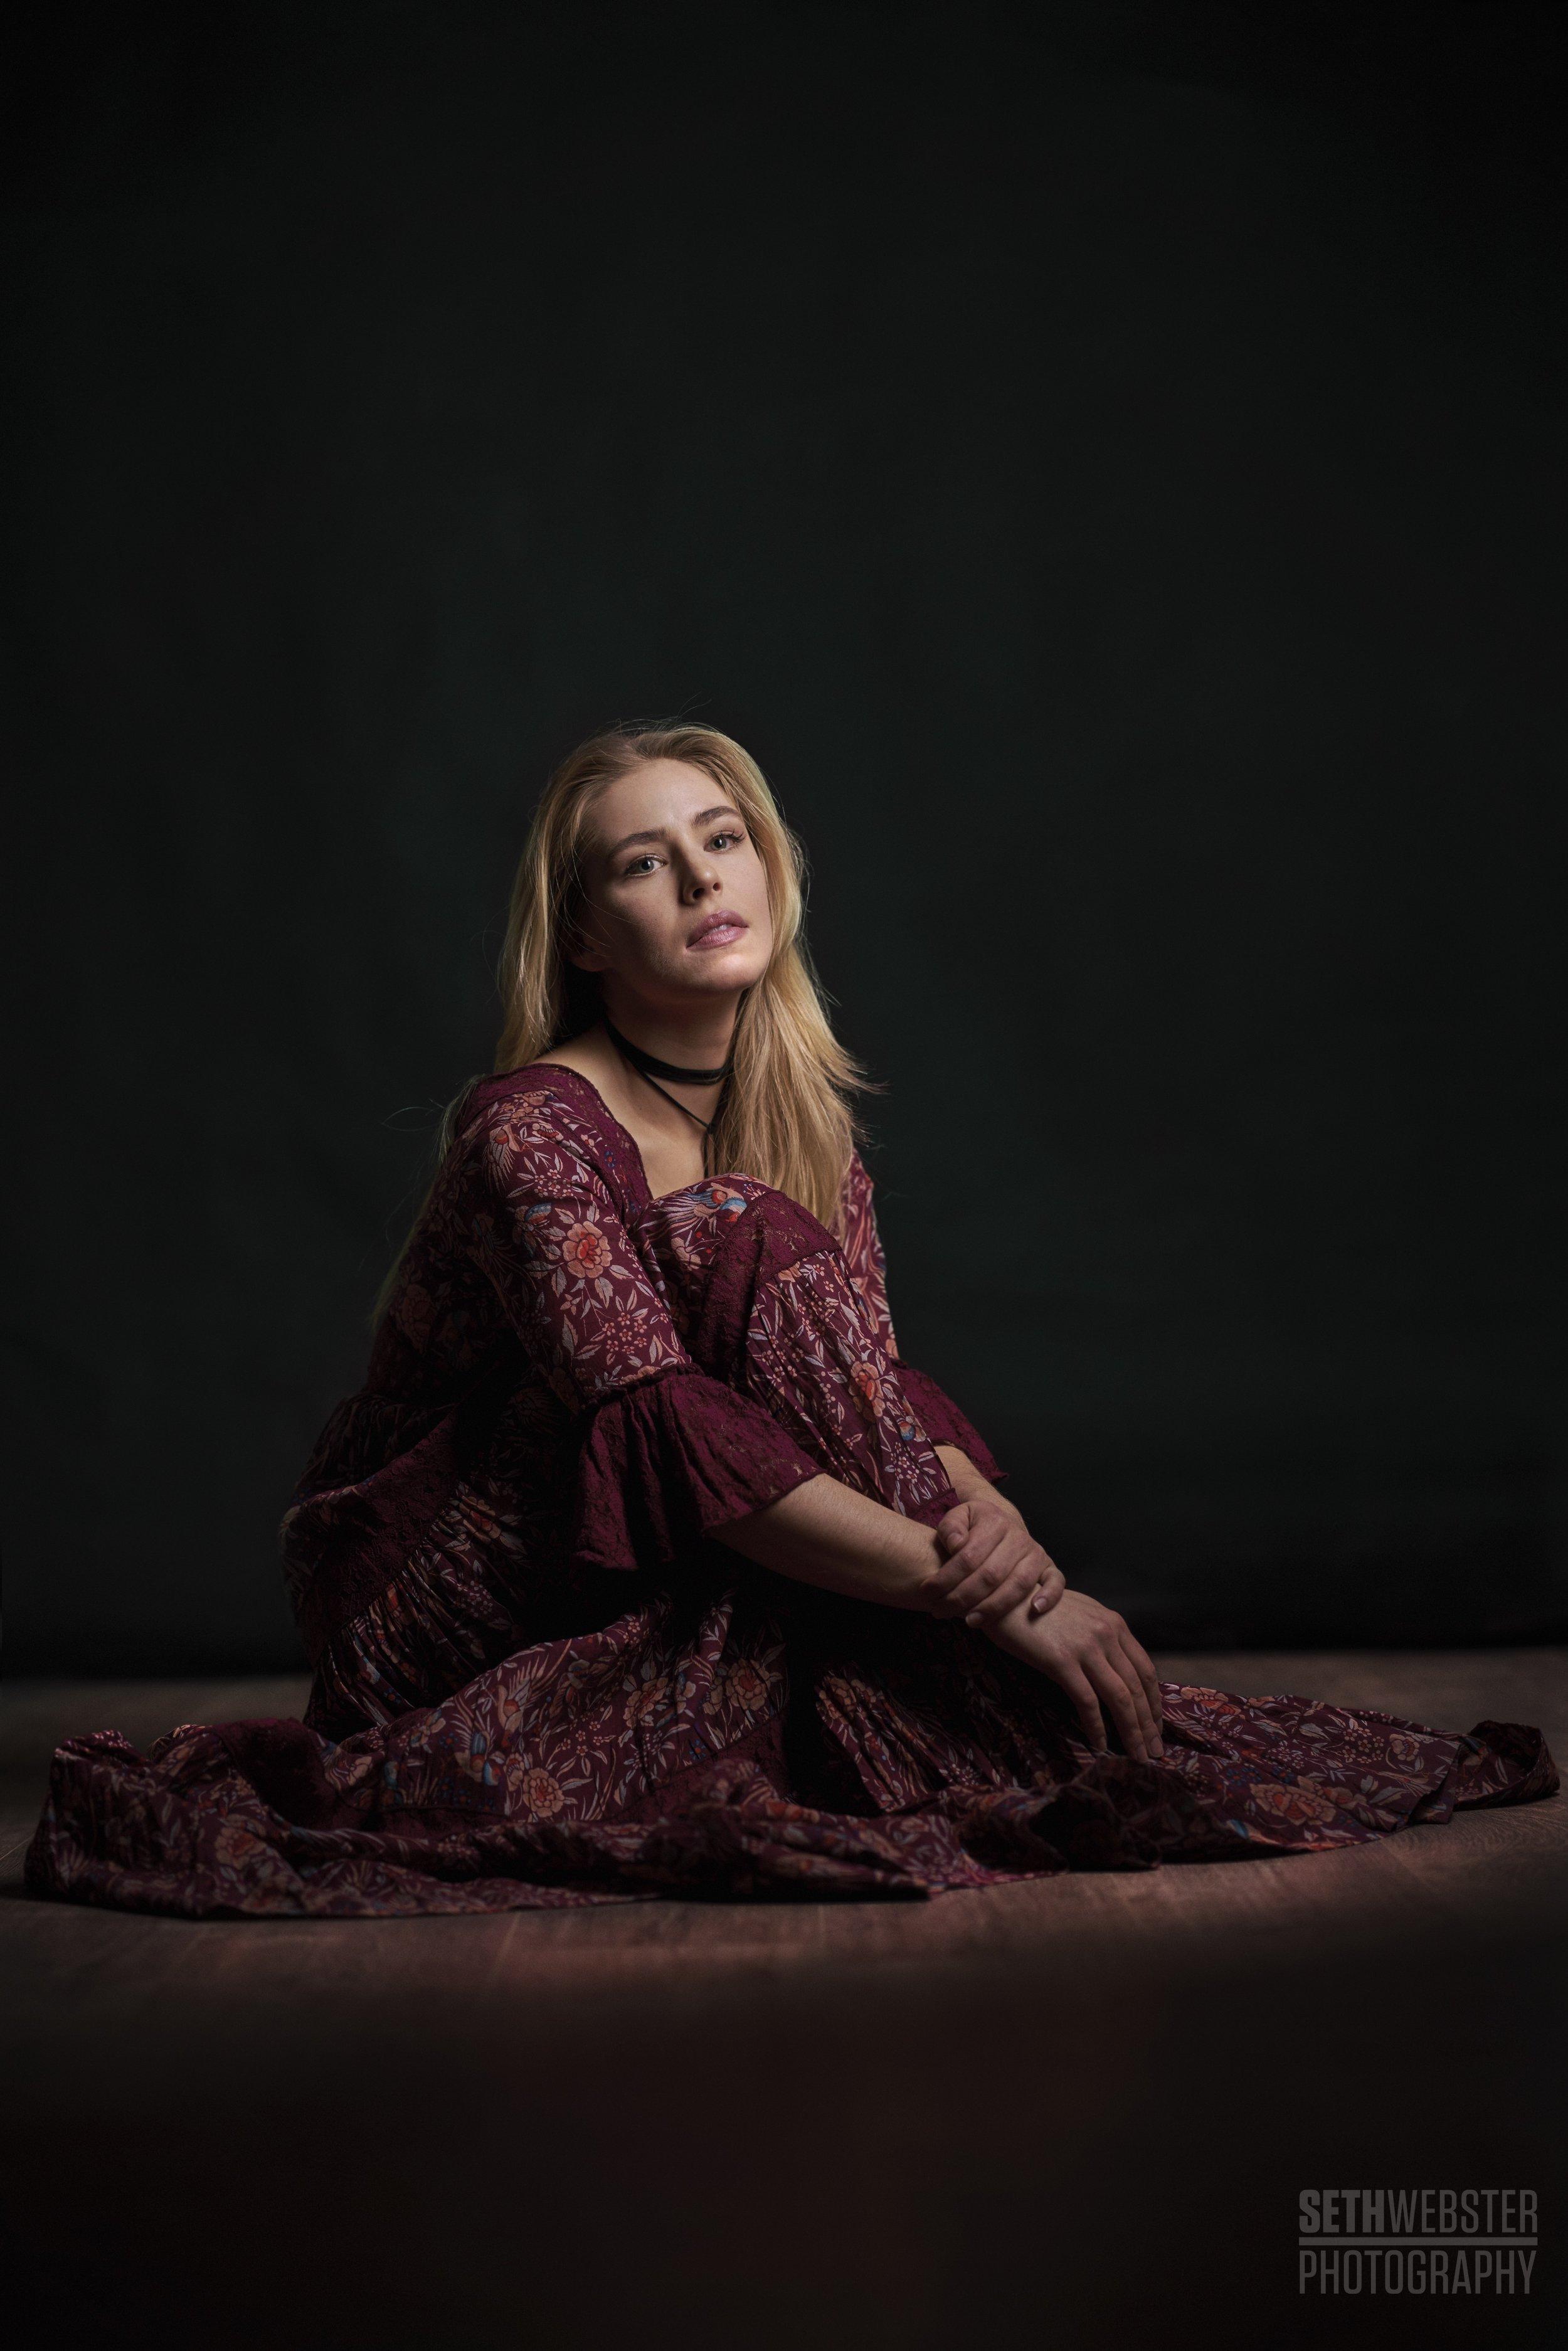 Alexandra Turshen, Actress & Filmmaker, Portrait